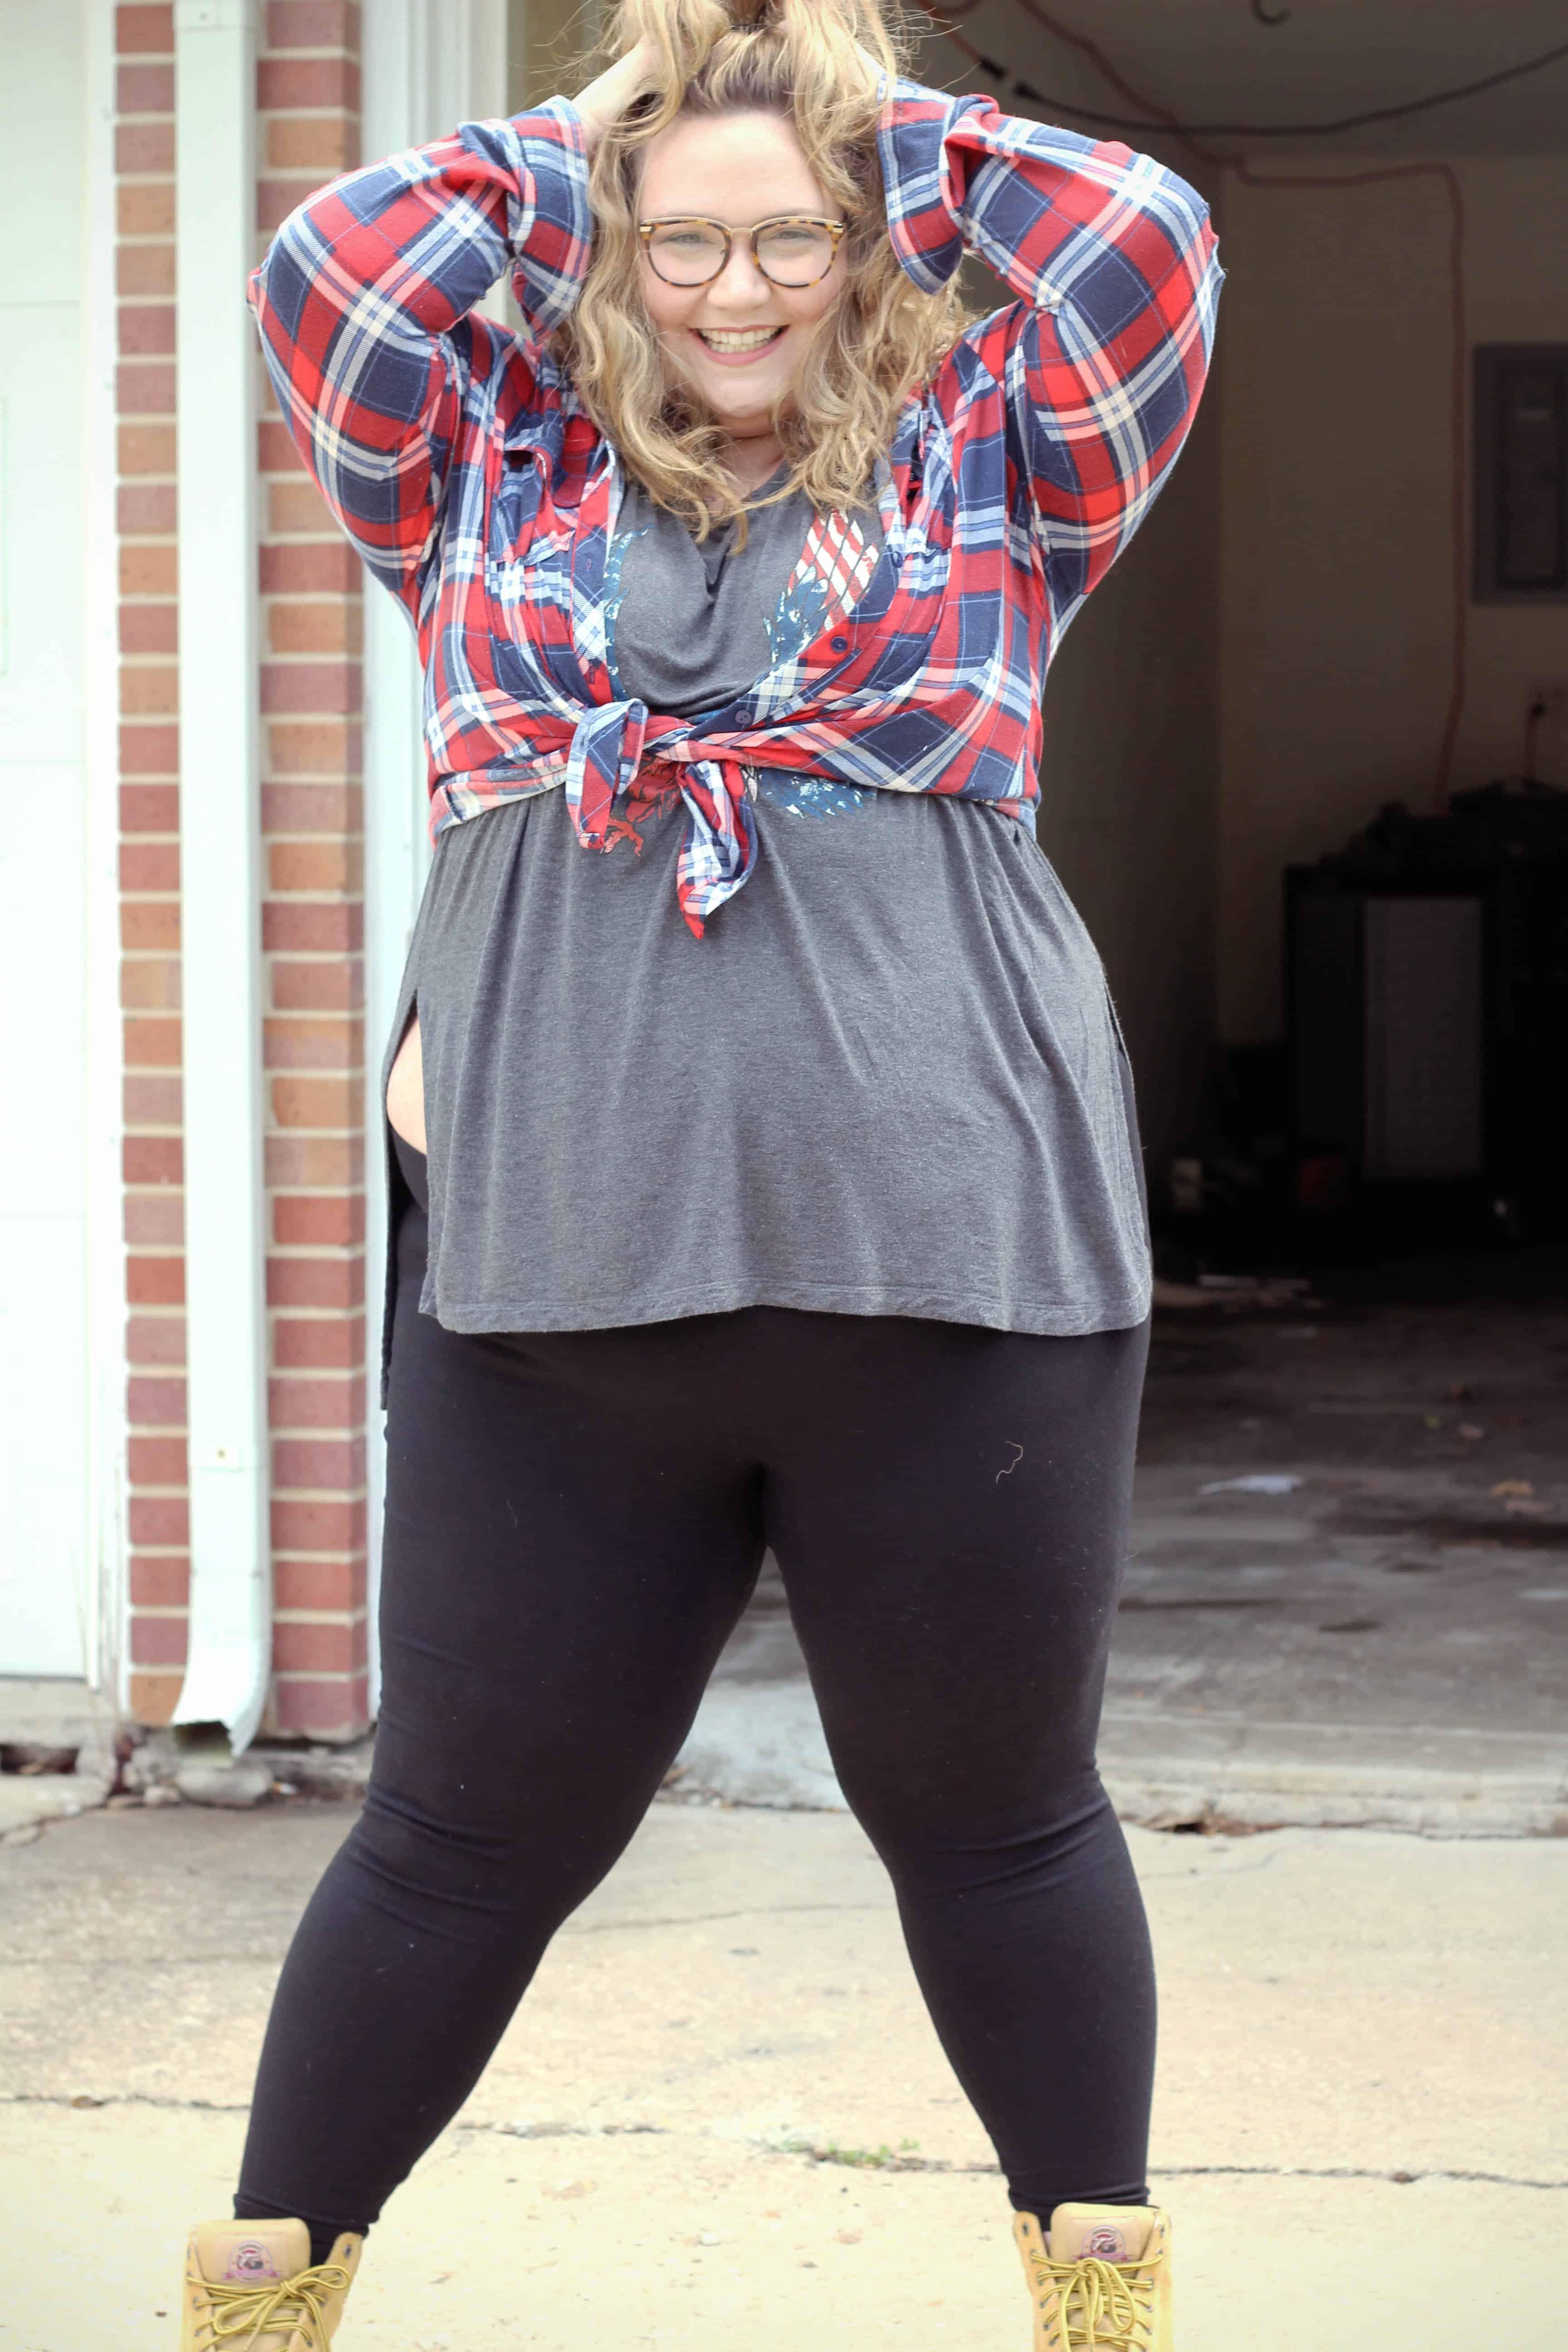 Fat Girl Grunge Fatgirlflow Com